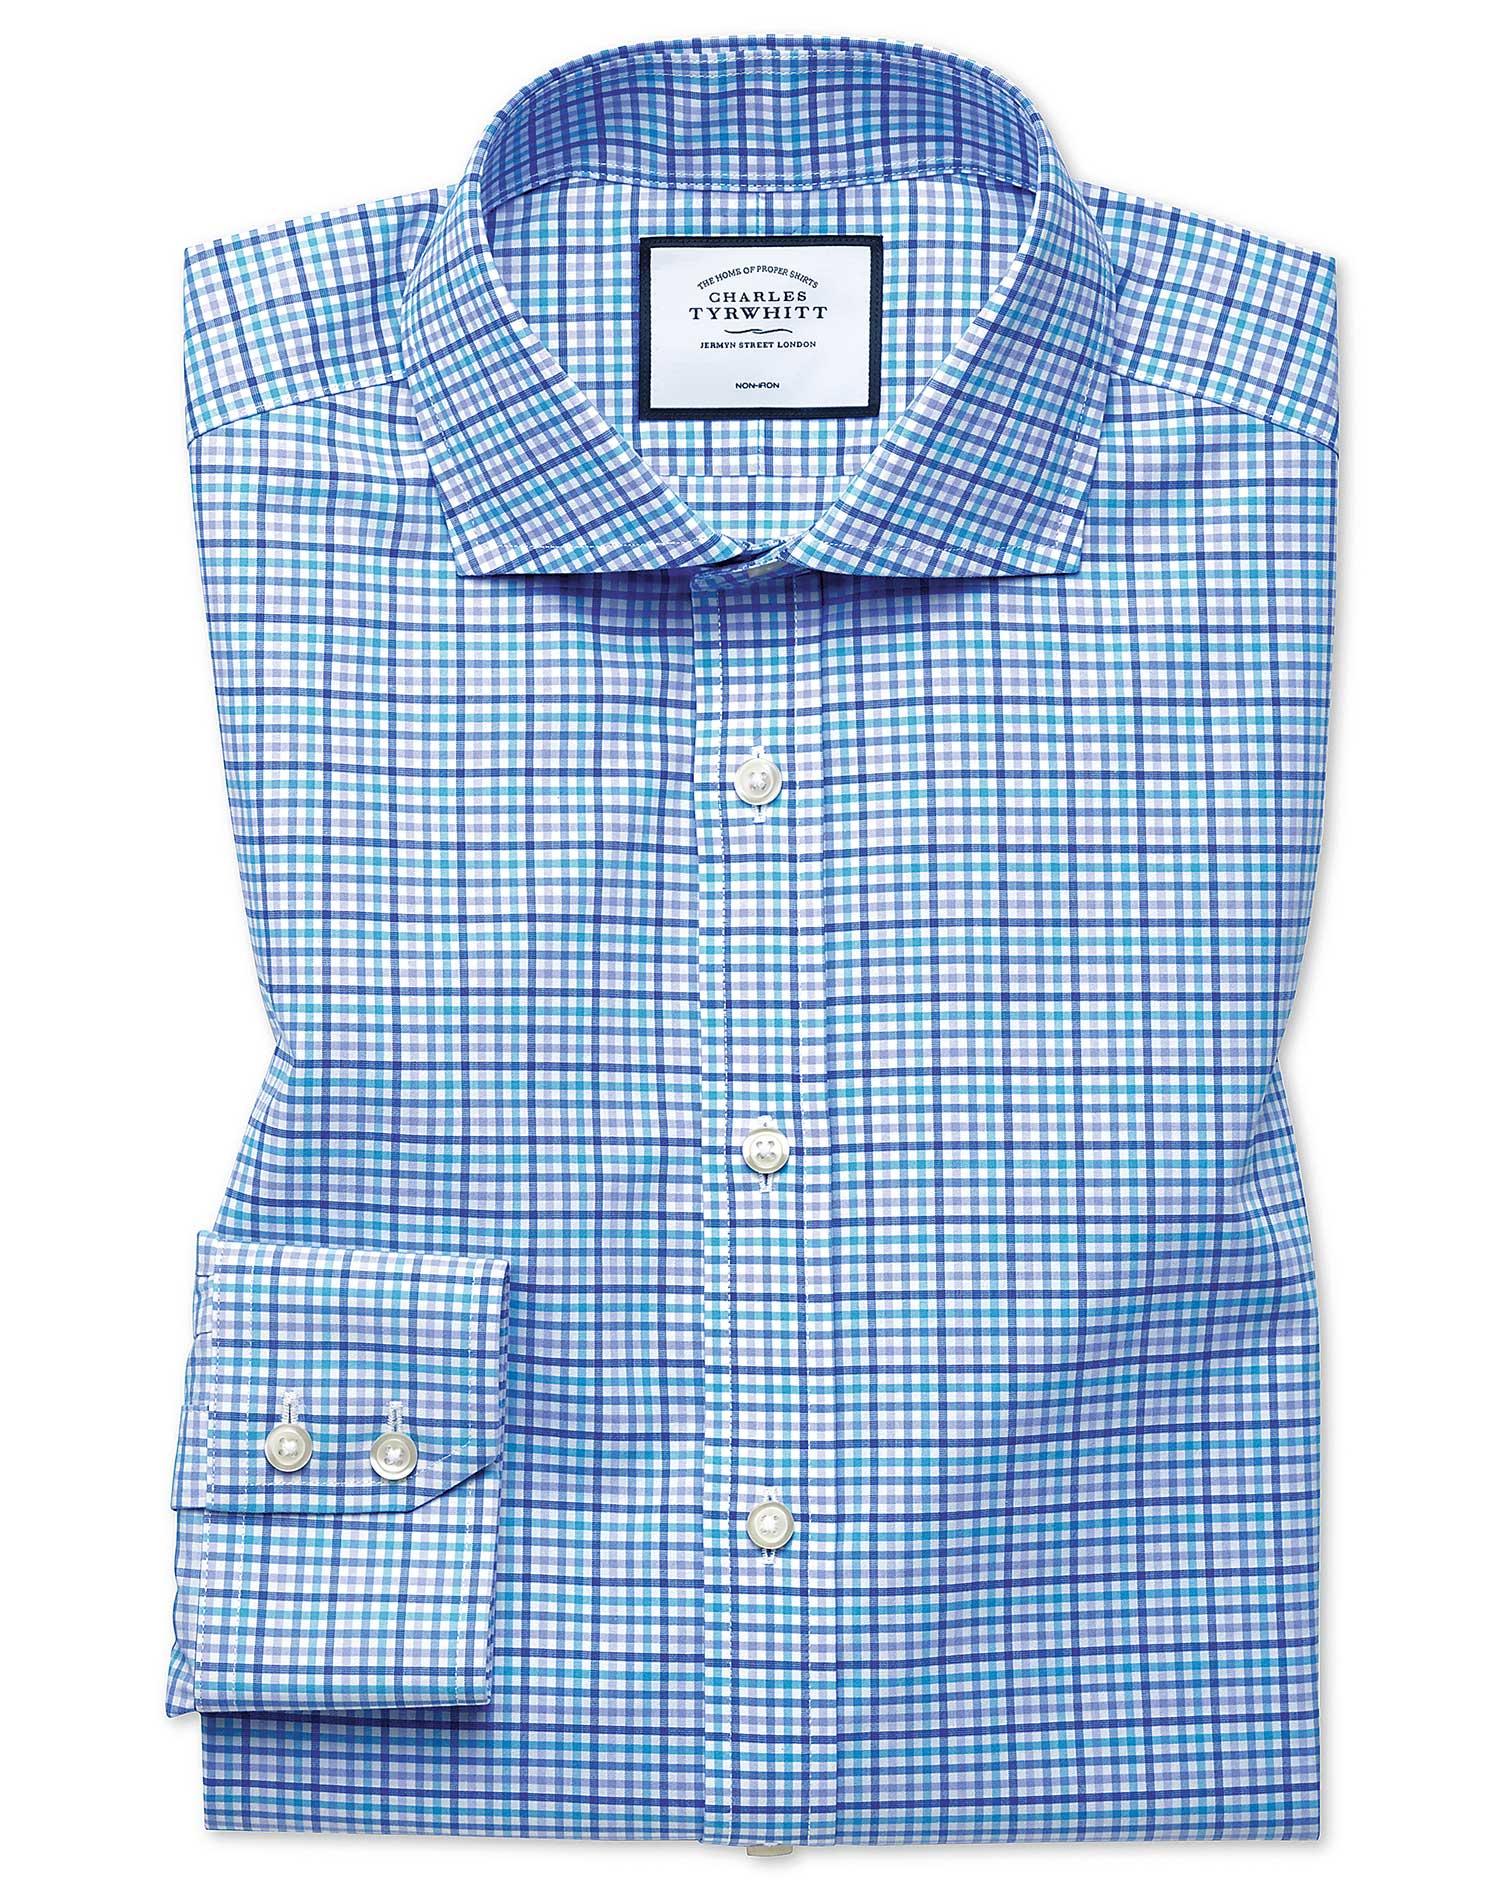 Extra Slim Fit Non-Iron Tyrwhitt Cool Poplin Purple Multi Cotton Formal Shirt Single Cuff Size 16/38